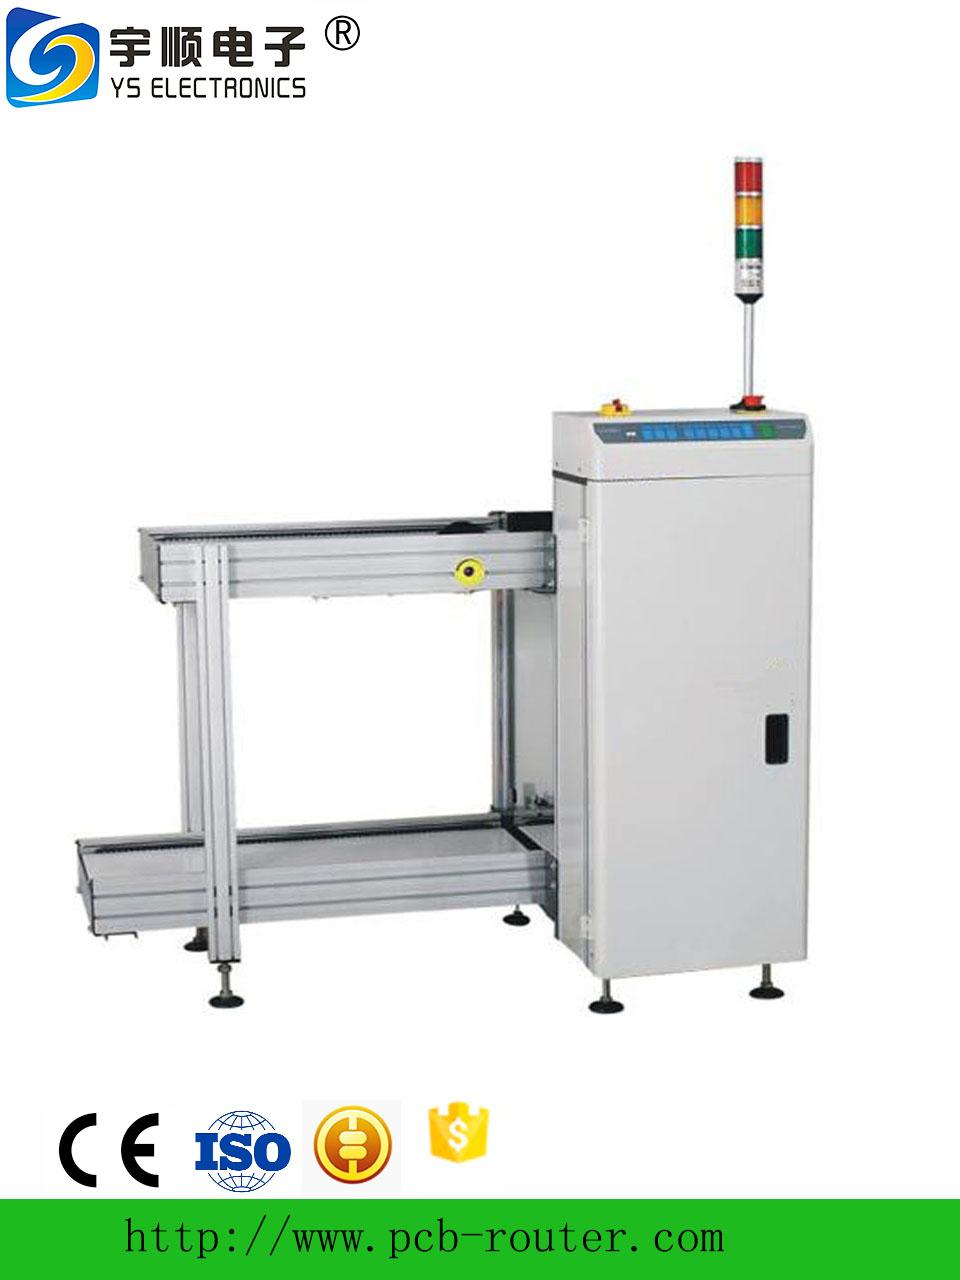 V Cut Machine Pcb V Grooving Pcb Depanelizer Router Pcb V